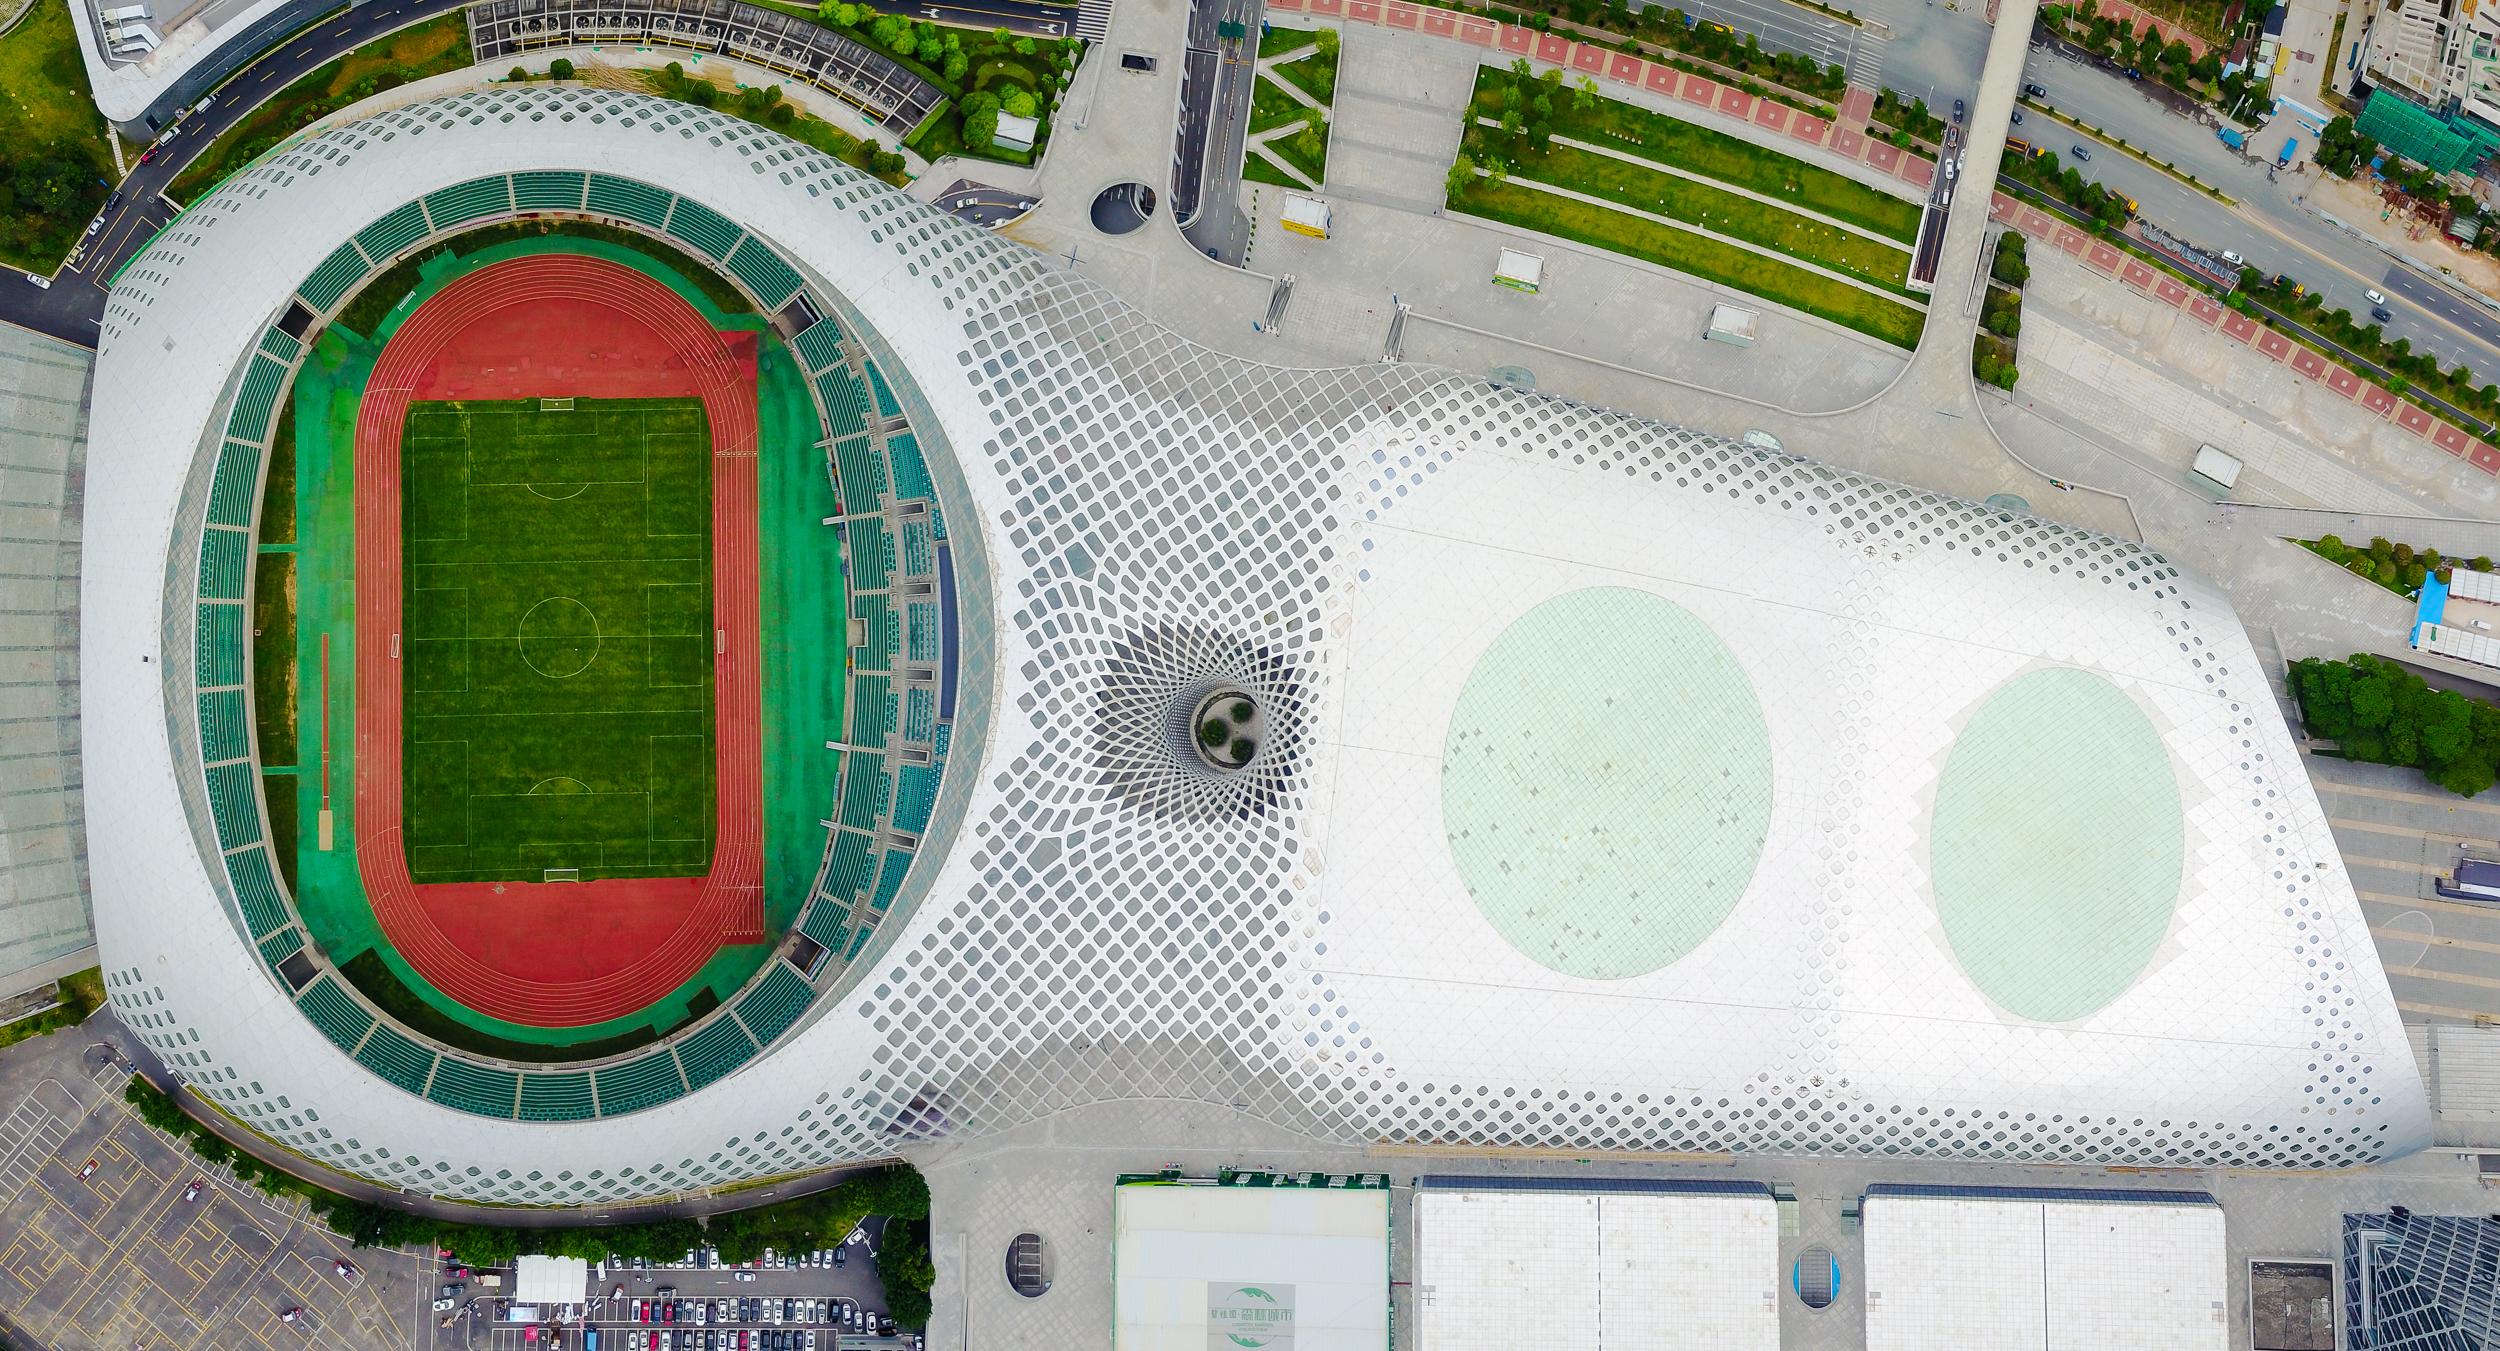 Shenzhen Sports Centre, China